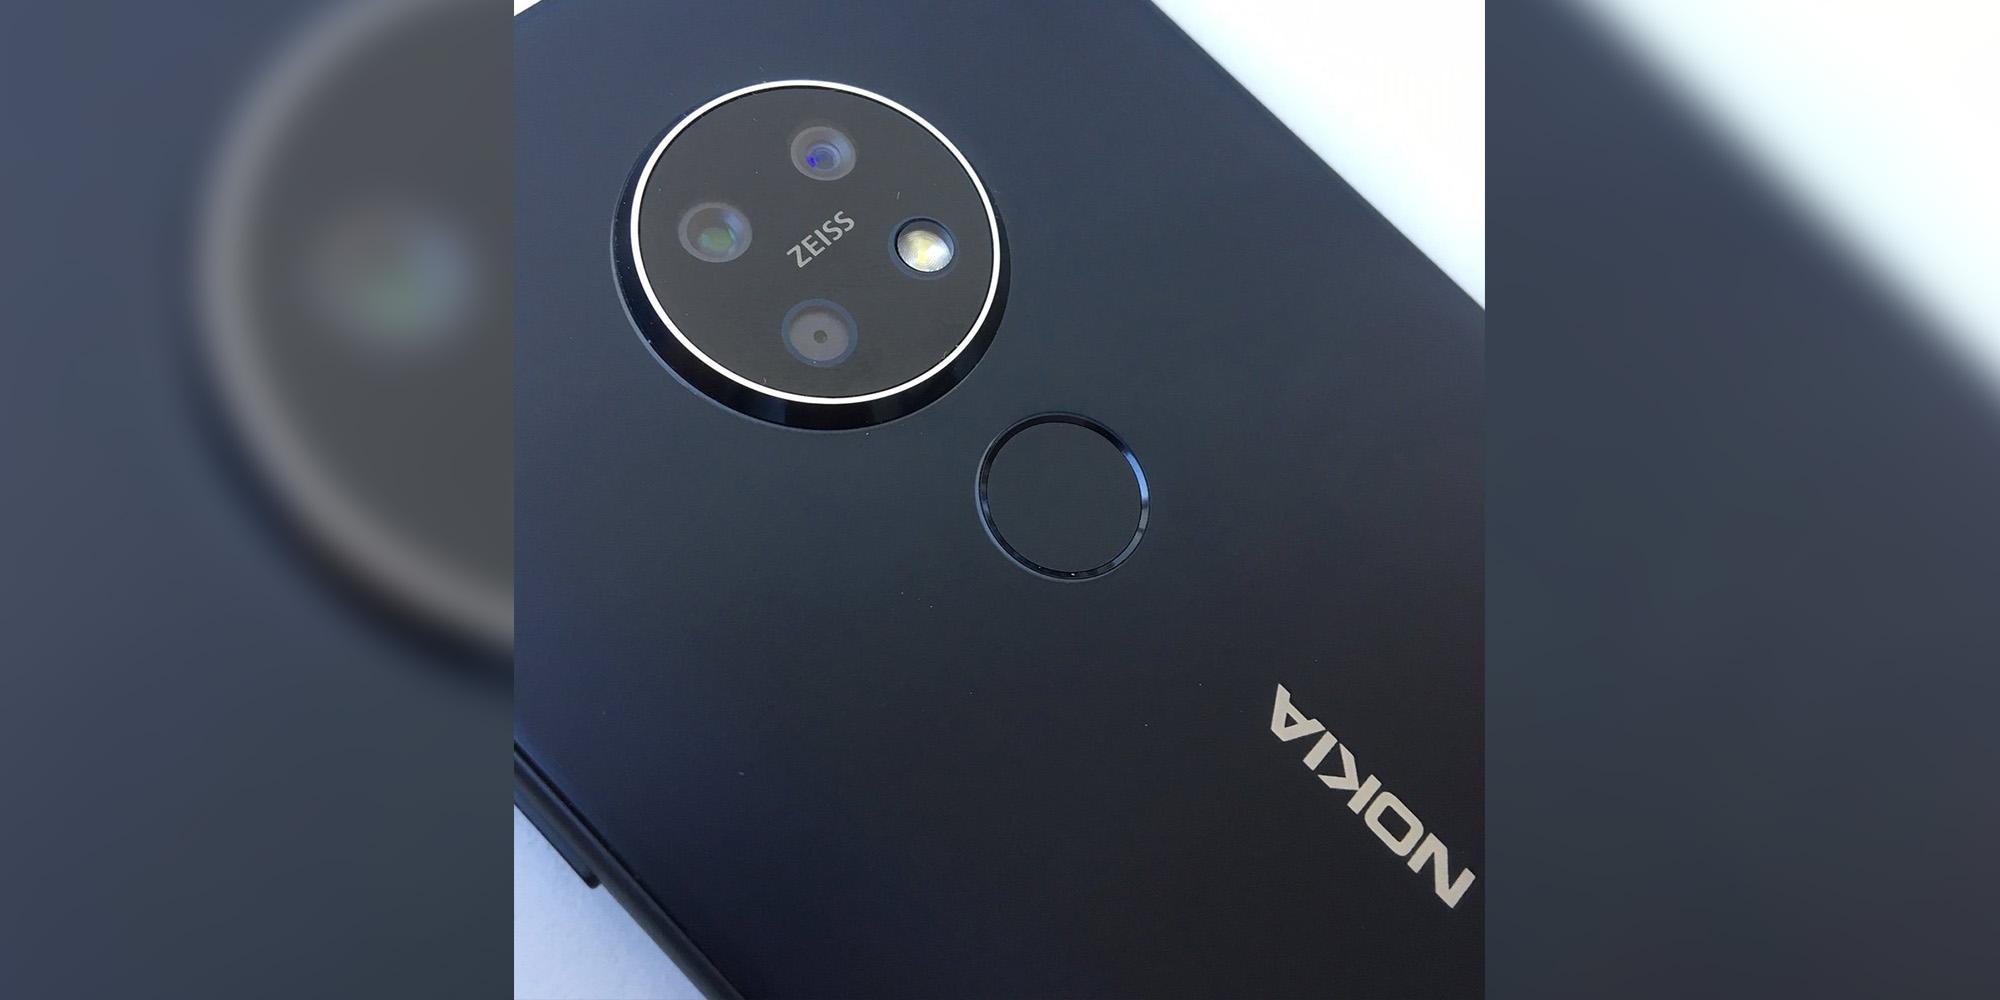 Nokia 7 2 Leak Confirms September Launch Triple Cameras 9to5google